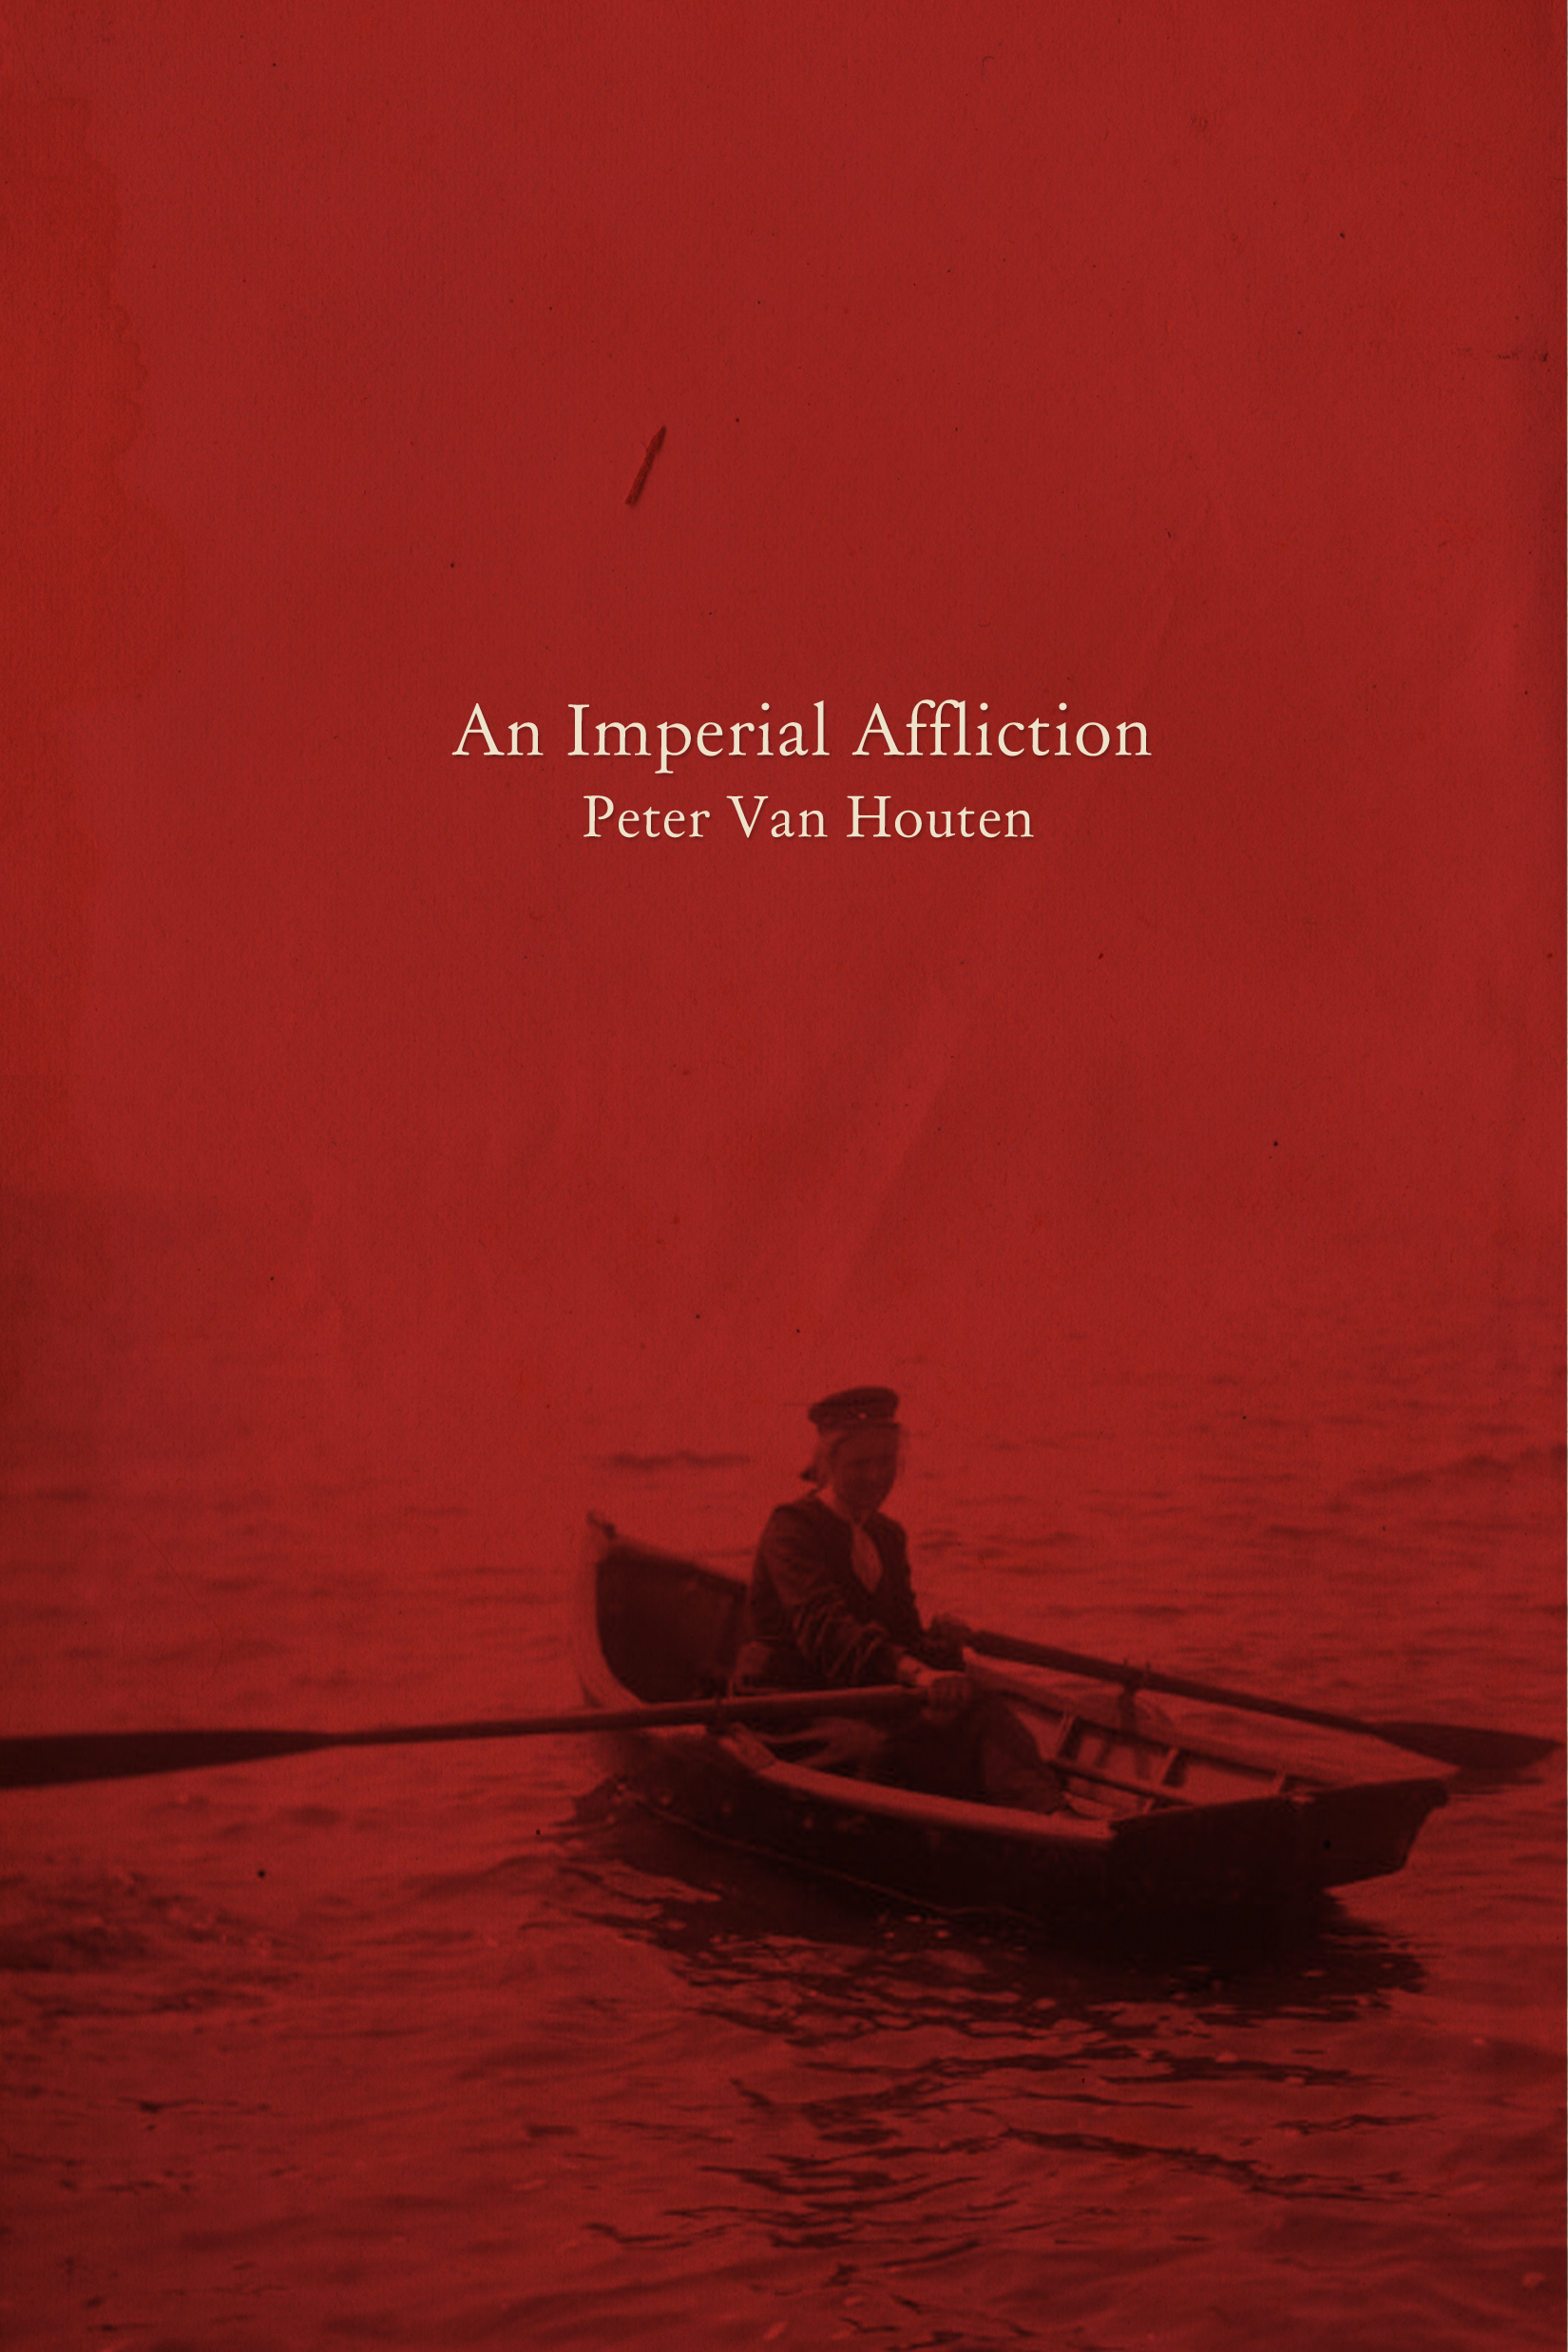 john green book covers by joviana carrillo at coroflot com